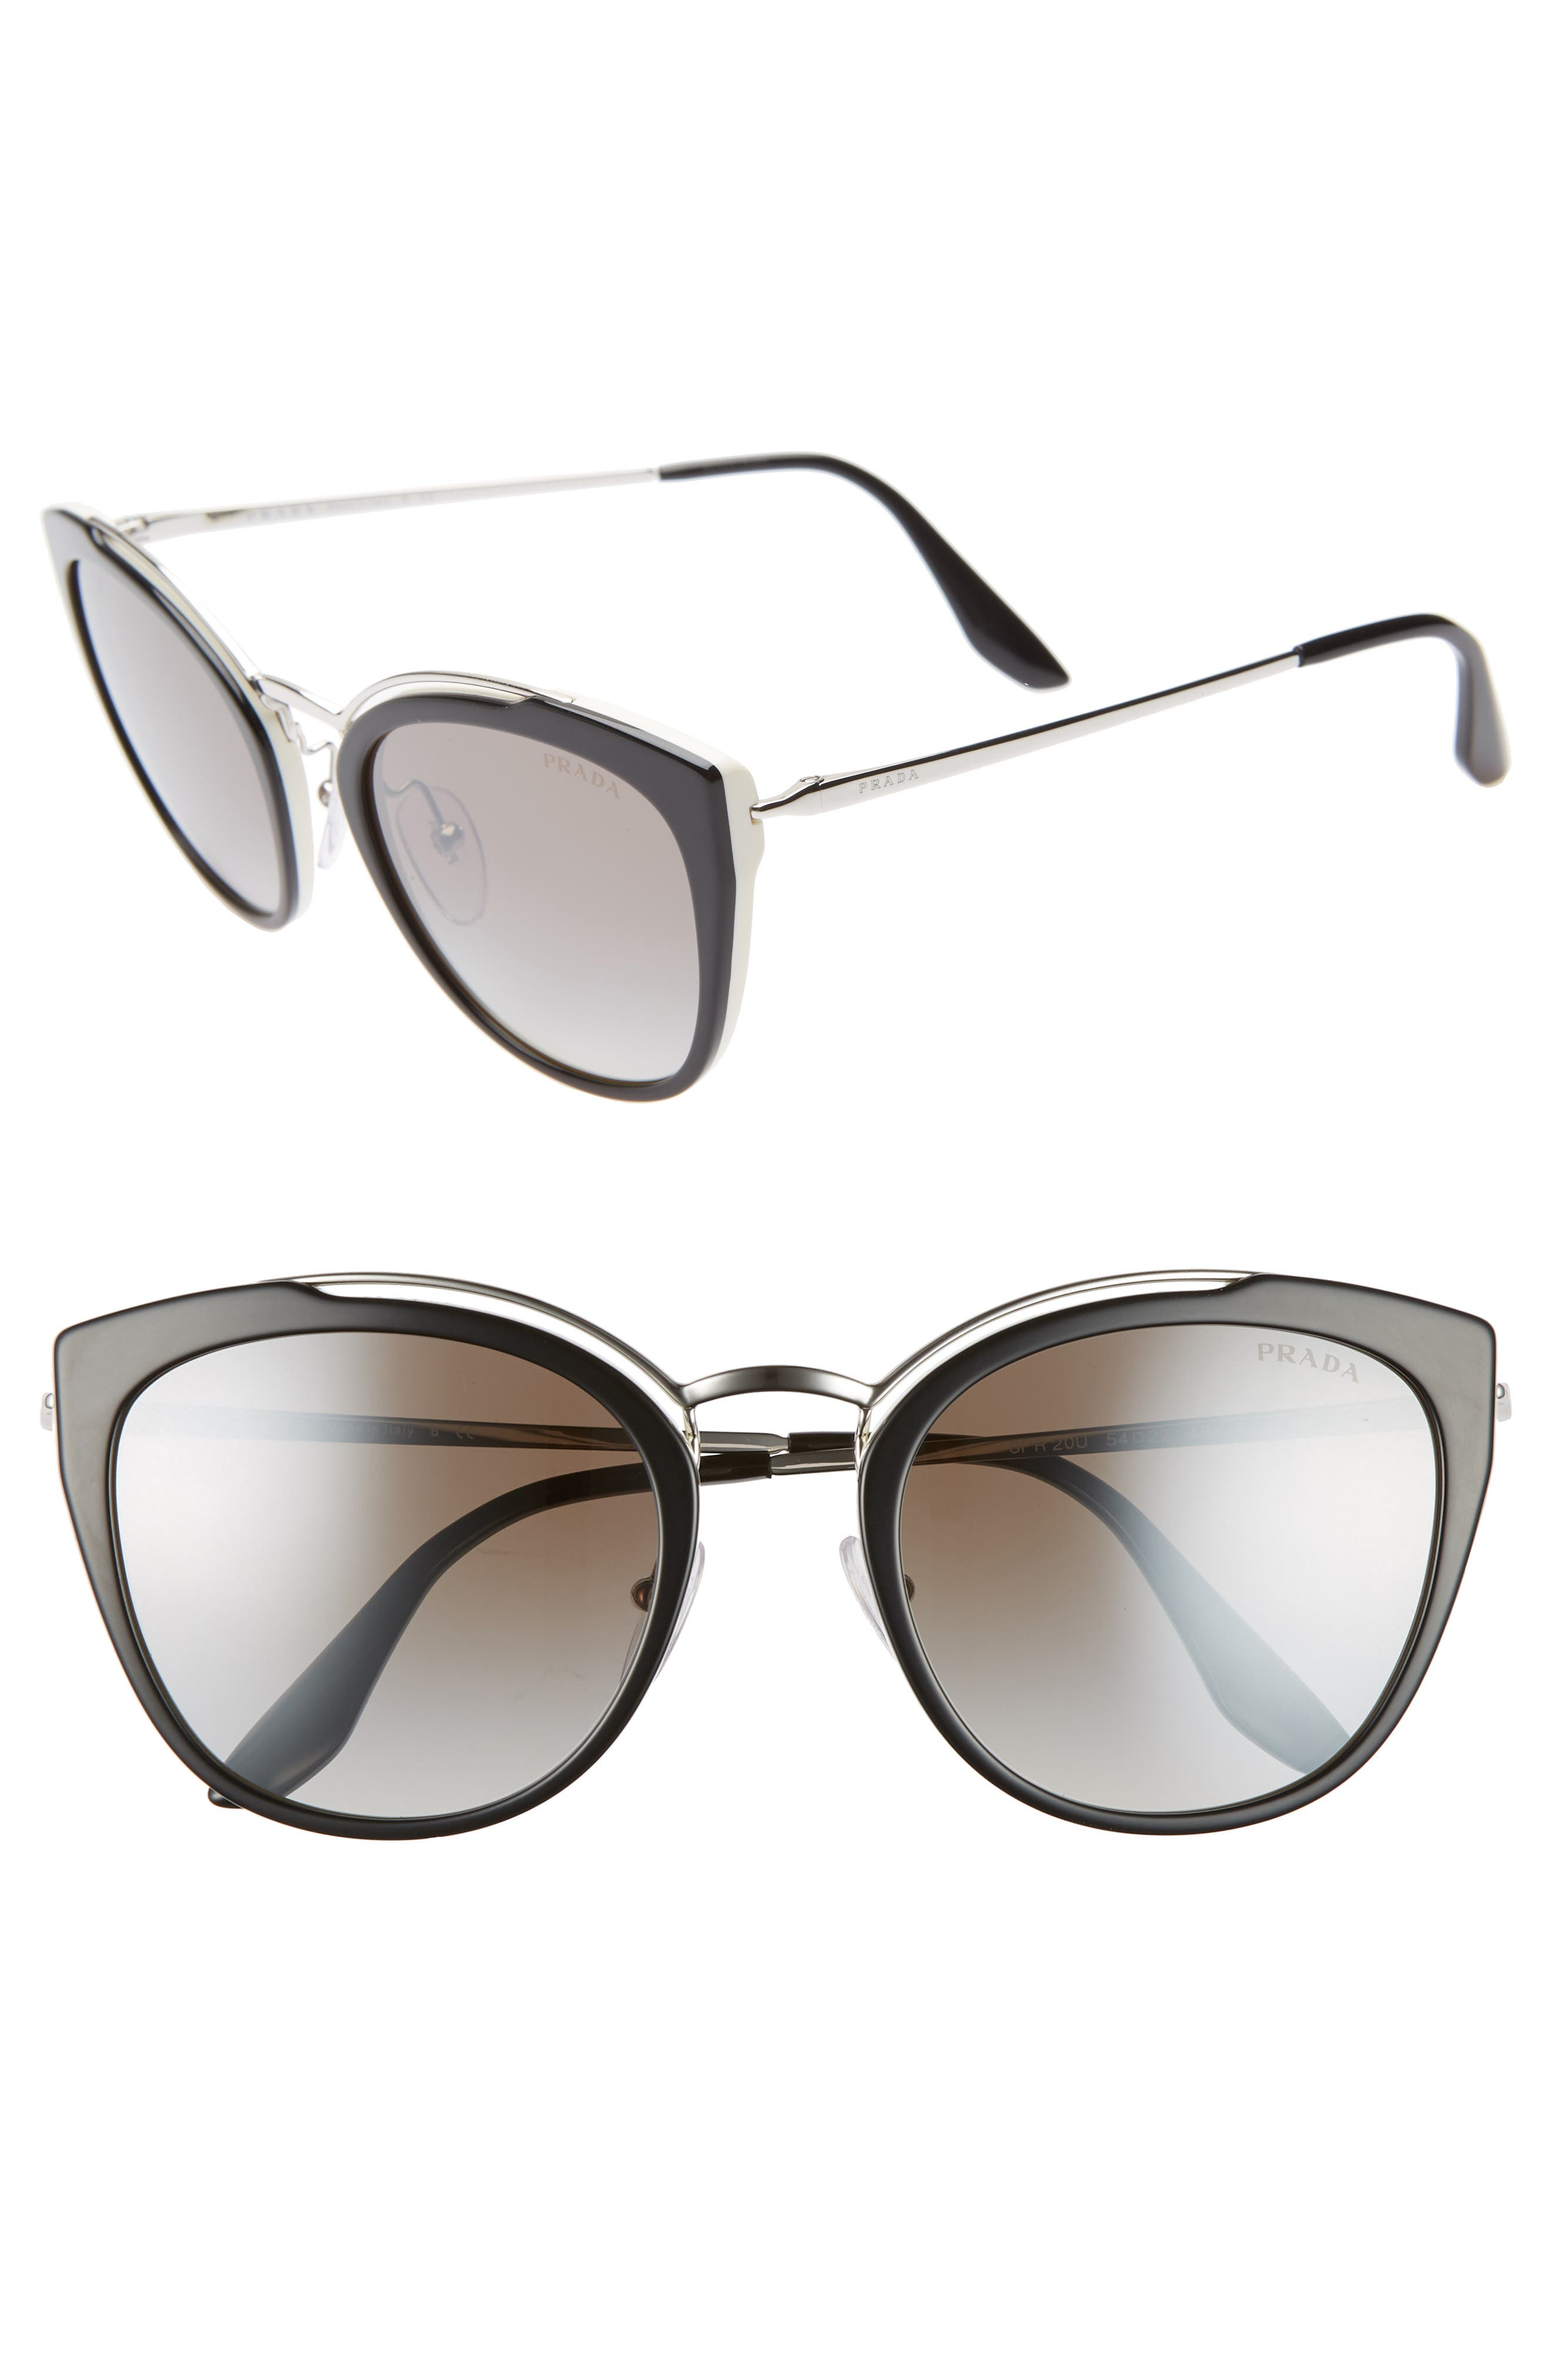 2f90e8140aa70 Women s Prada Cat-Eye Sunglasses